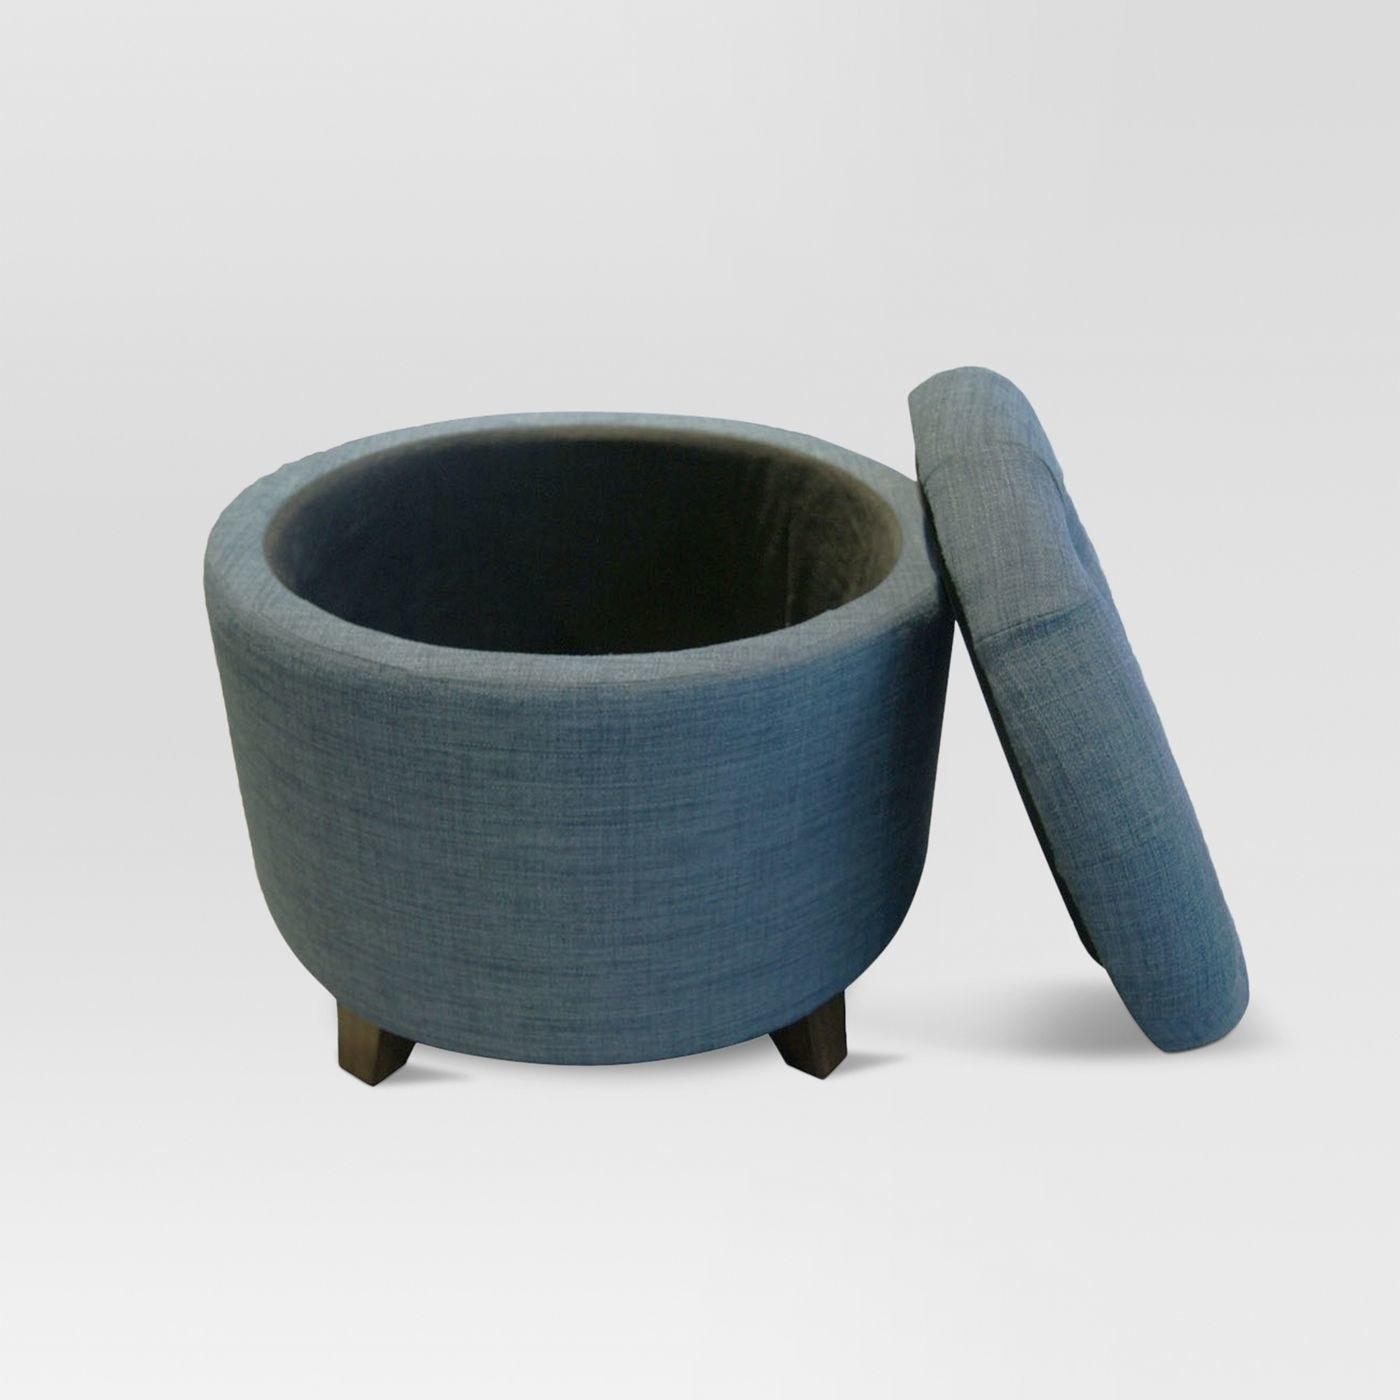 The heathered blue tufted round floor ottoman